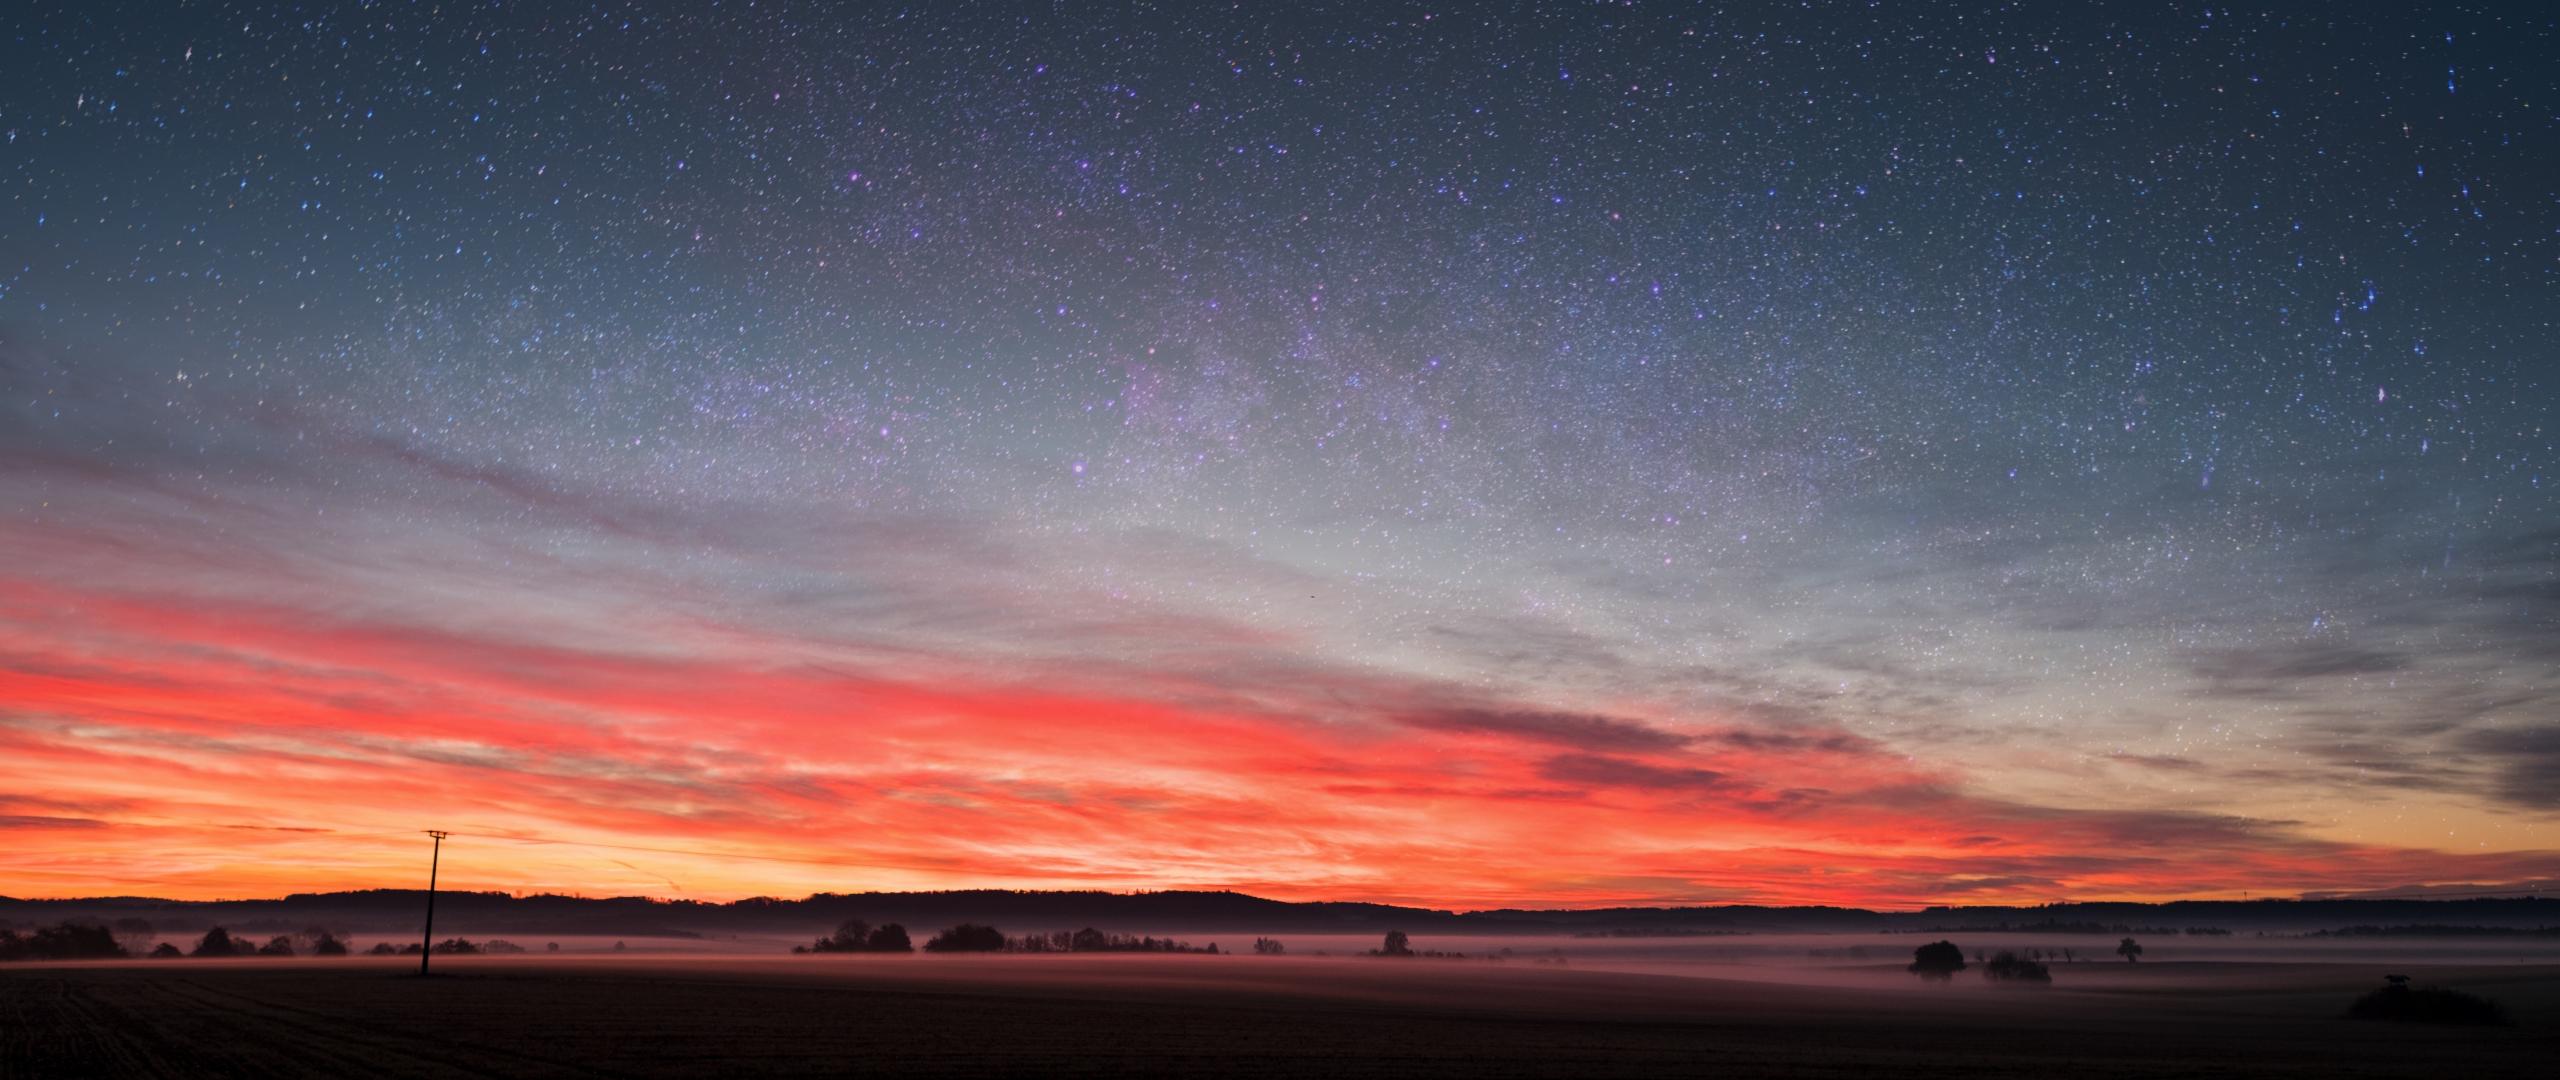 Download 2560x1080 Wallpaper Fog Sunset Silhouette